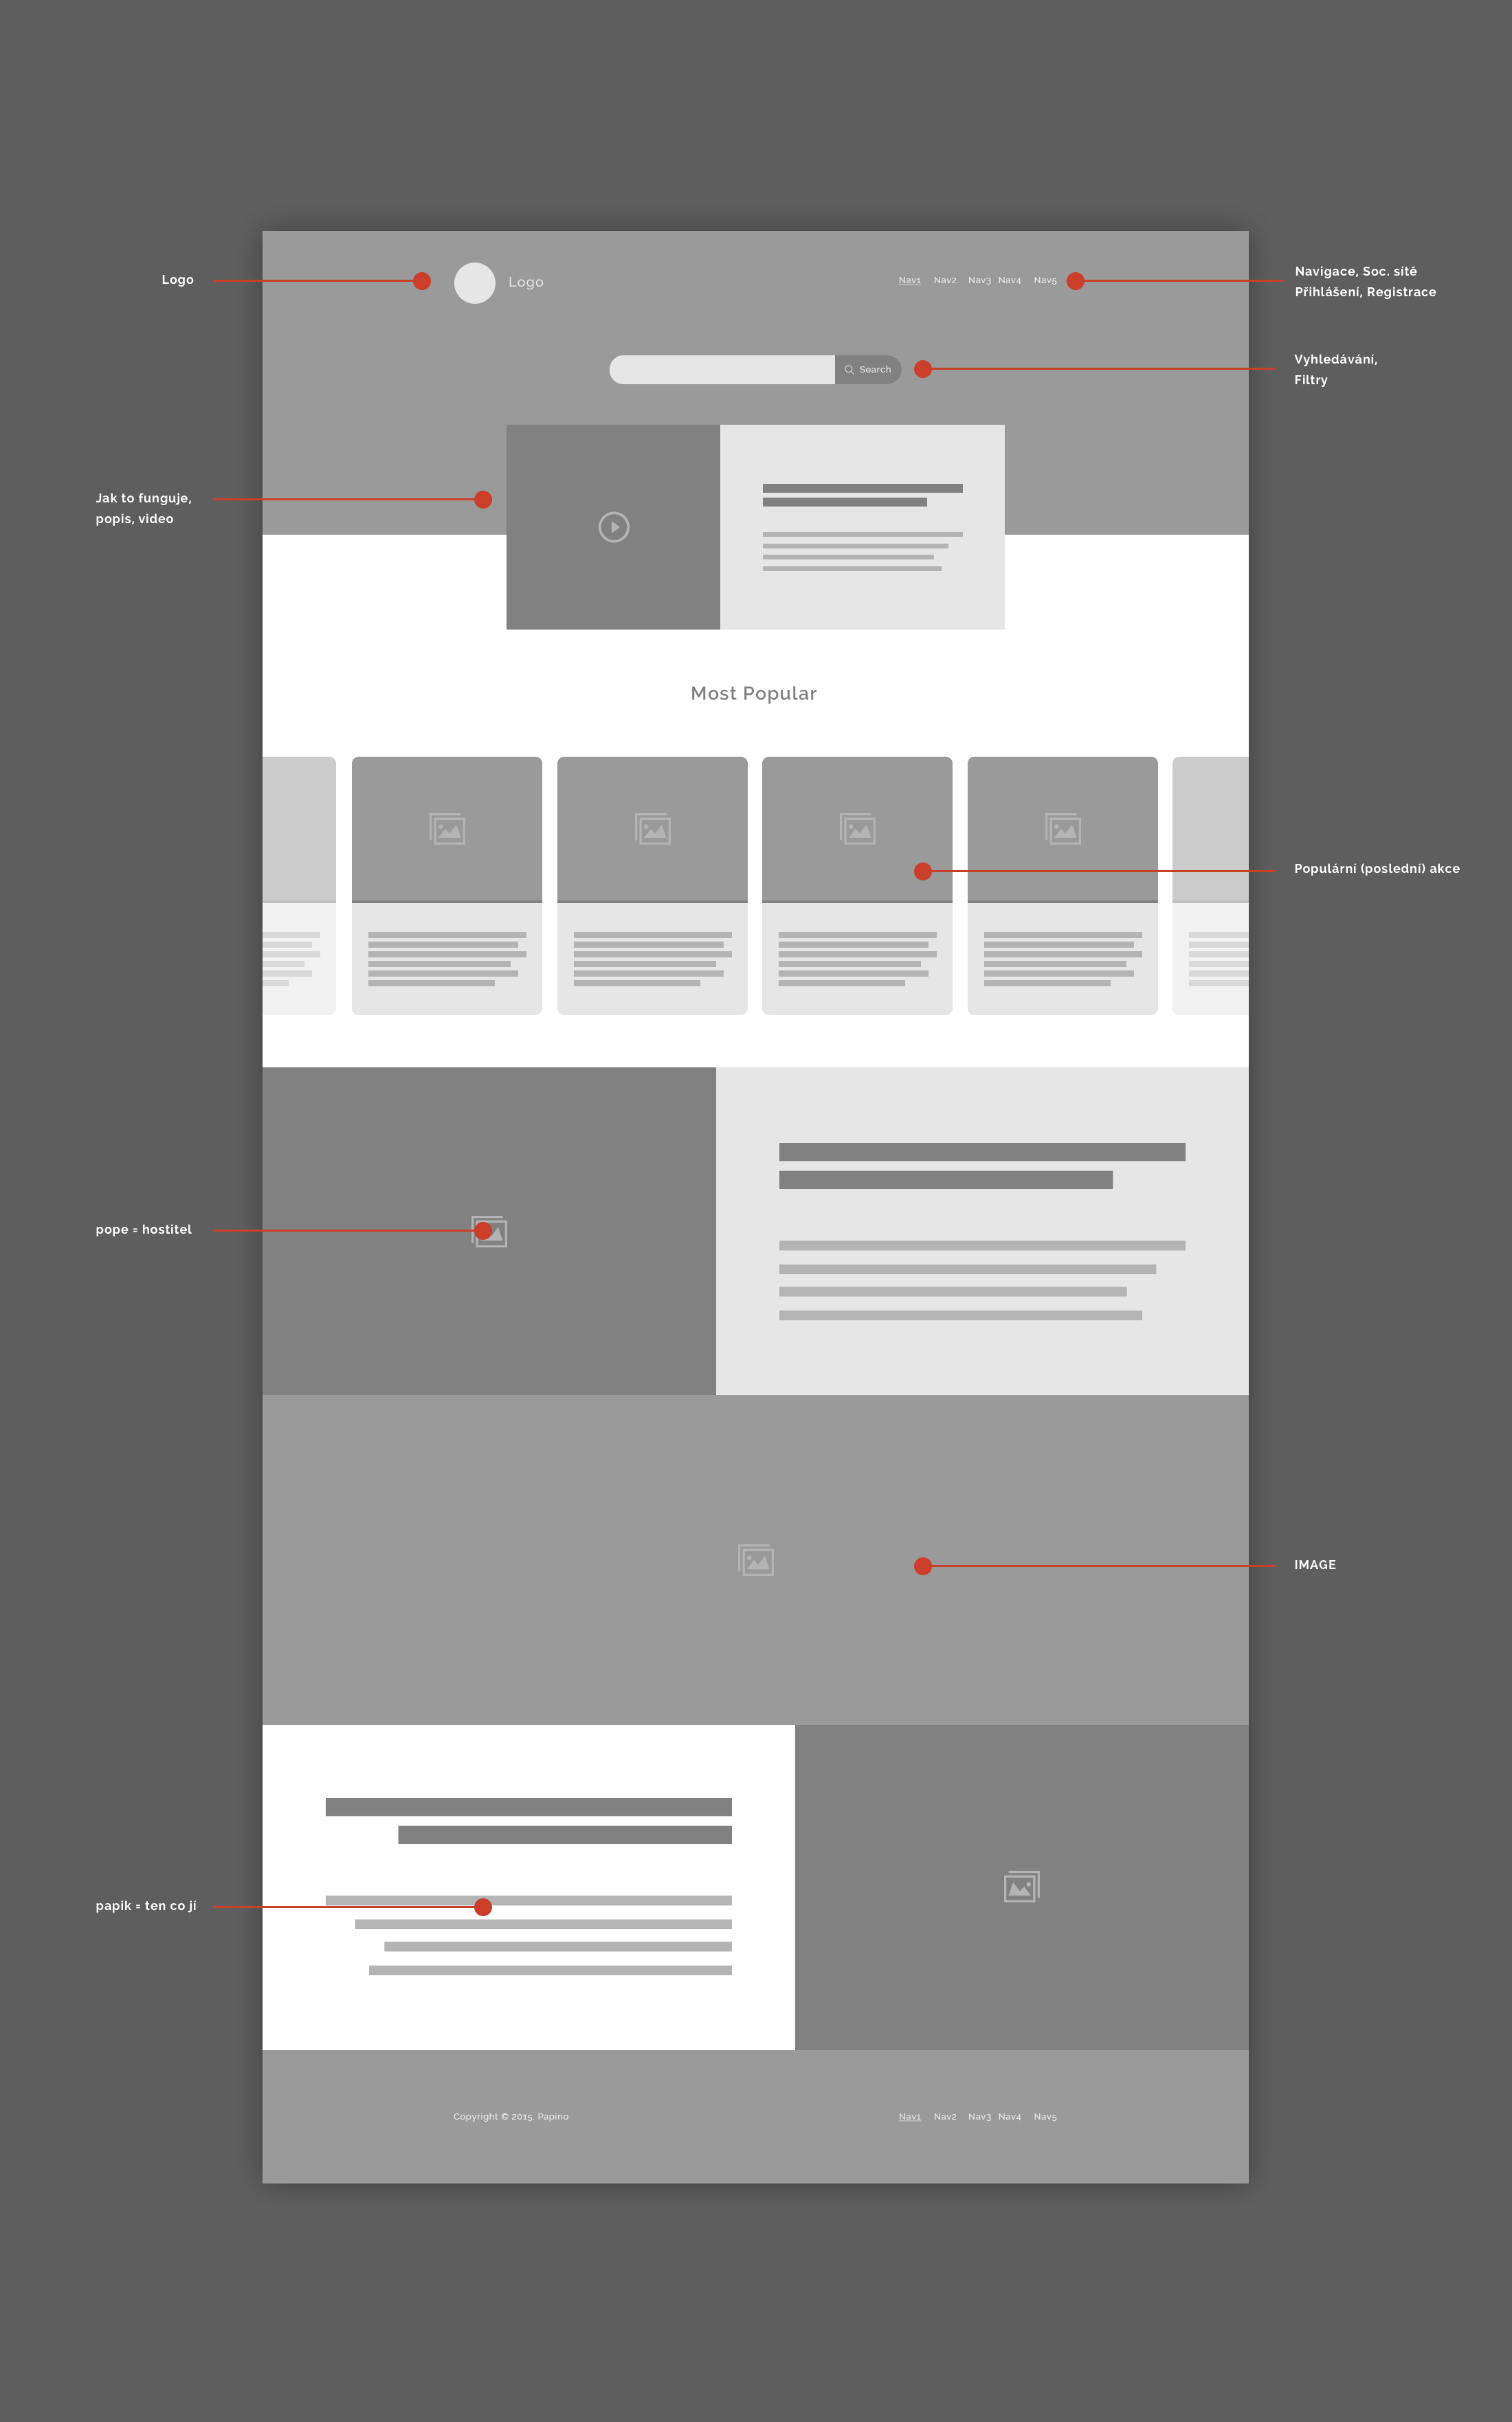 Серый дизайн / UX дизайн Startup Papino Homepage Wireframe #interfacedesign